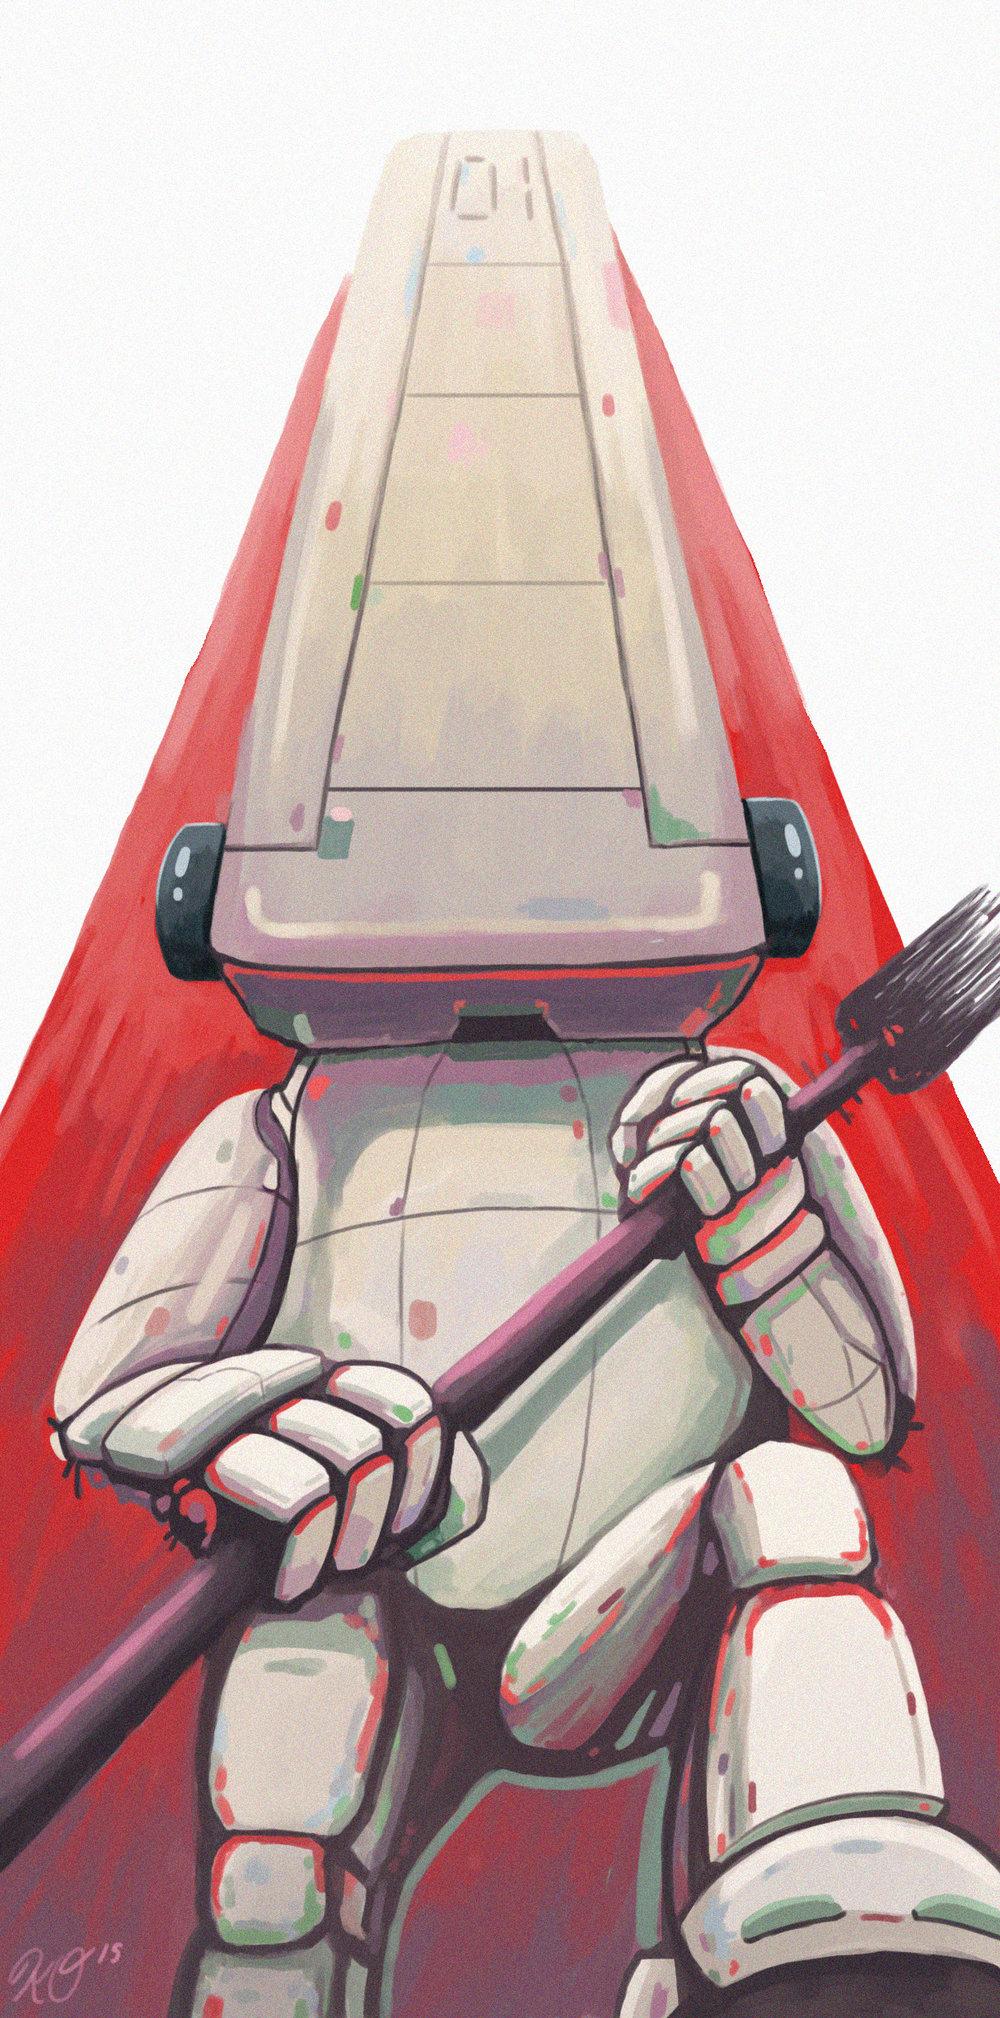 Chimbly Bot